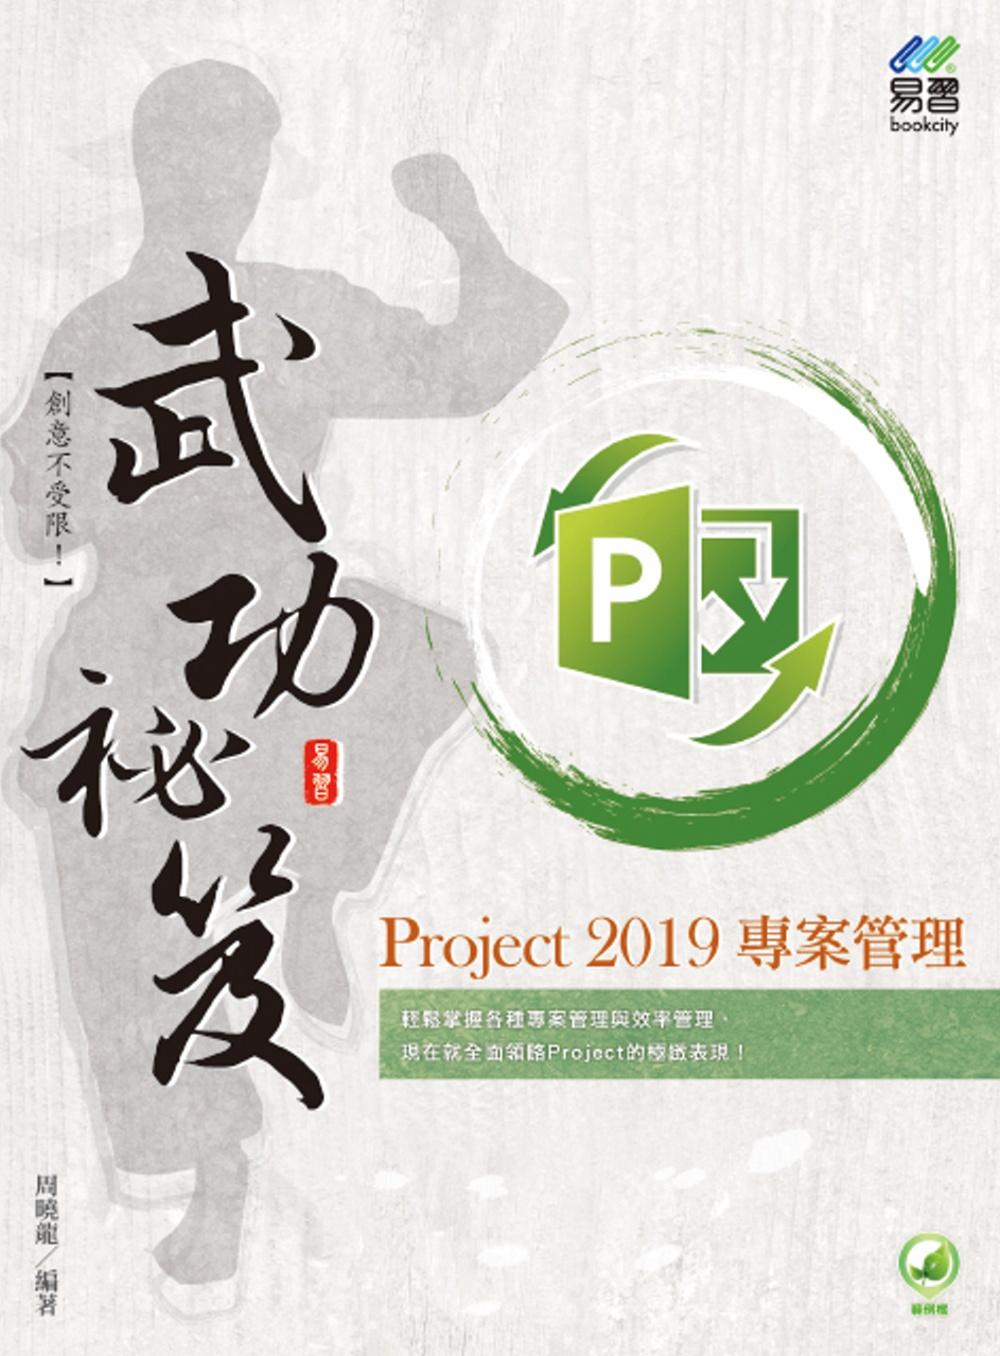 Project 2019 專案...